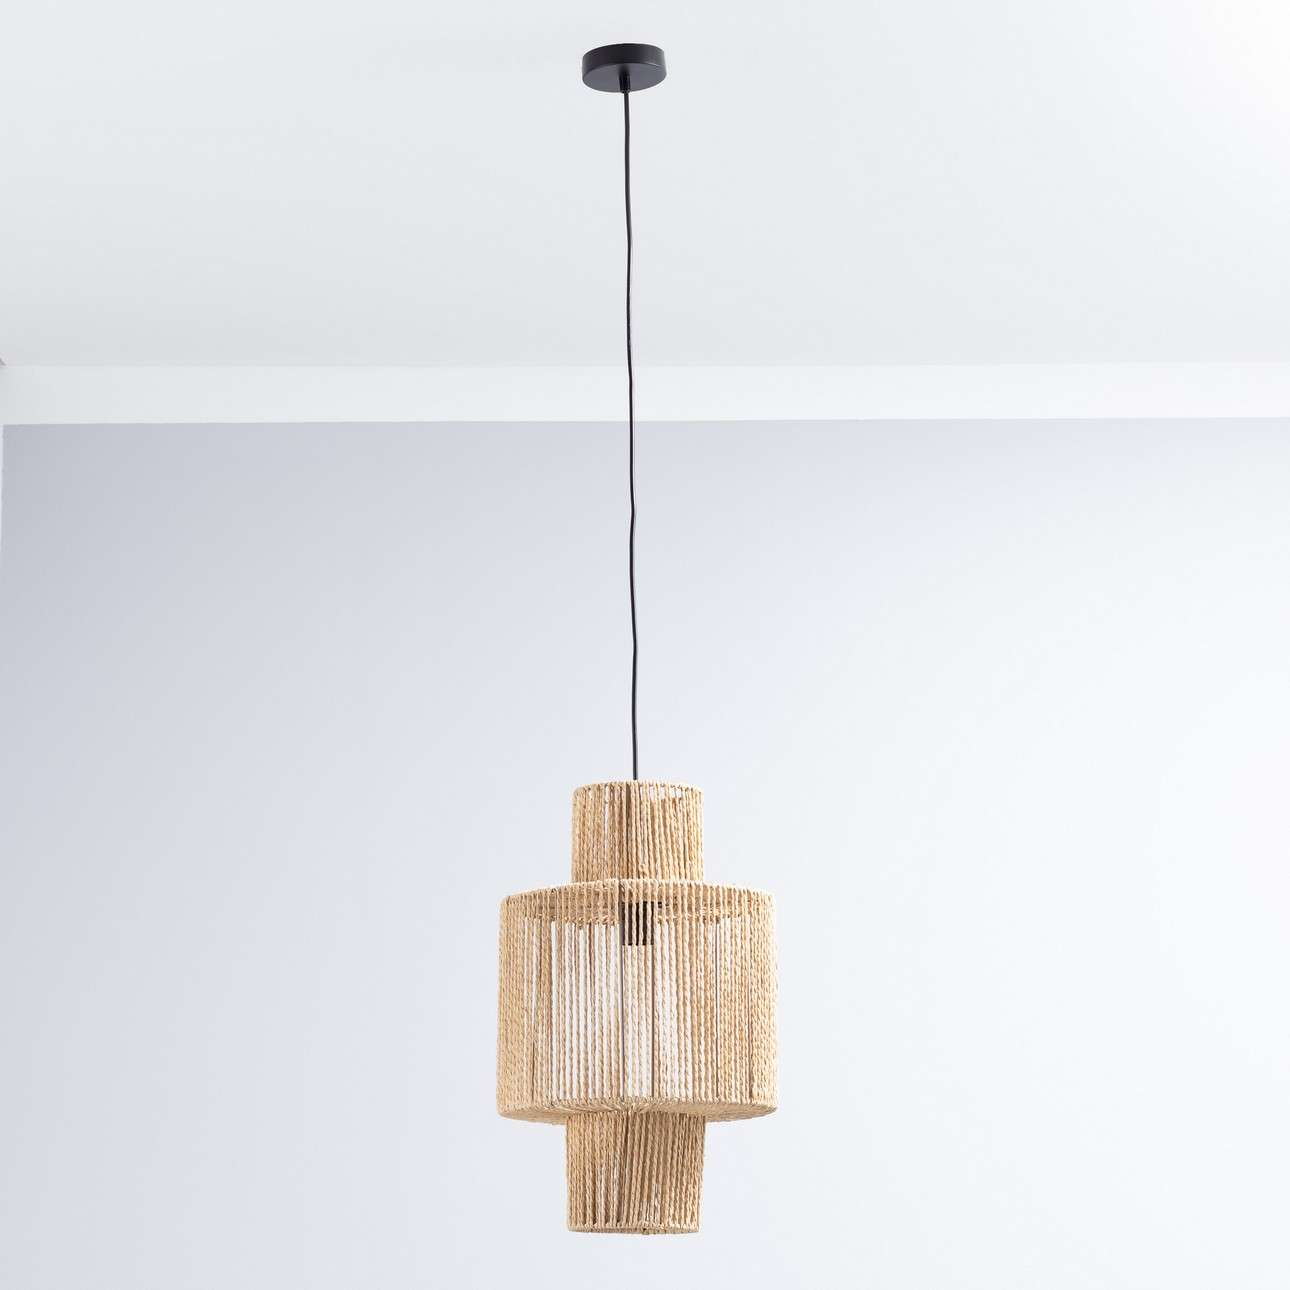 Lampa wisząca Abir 49cm